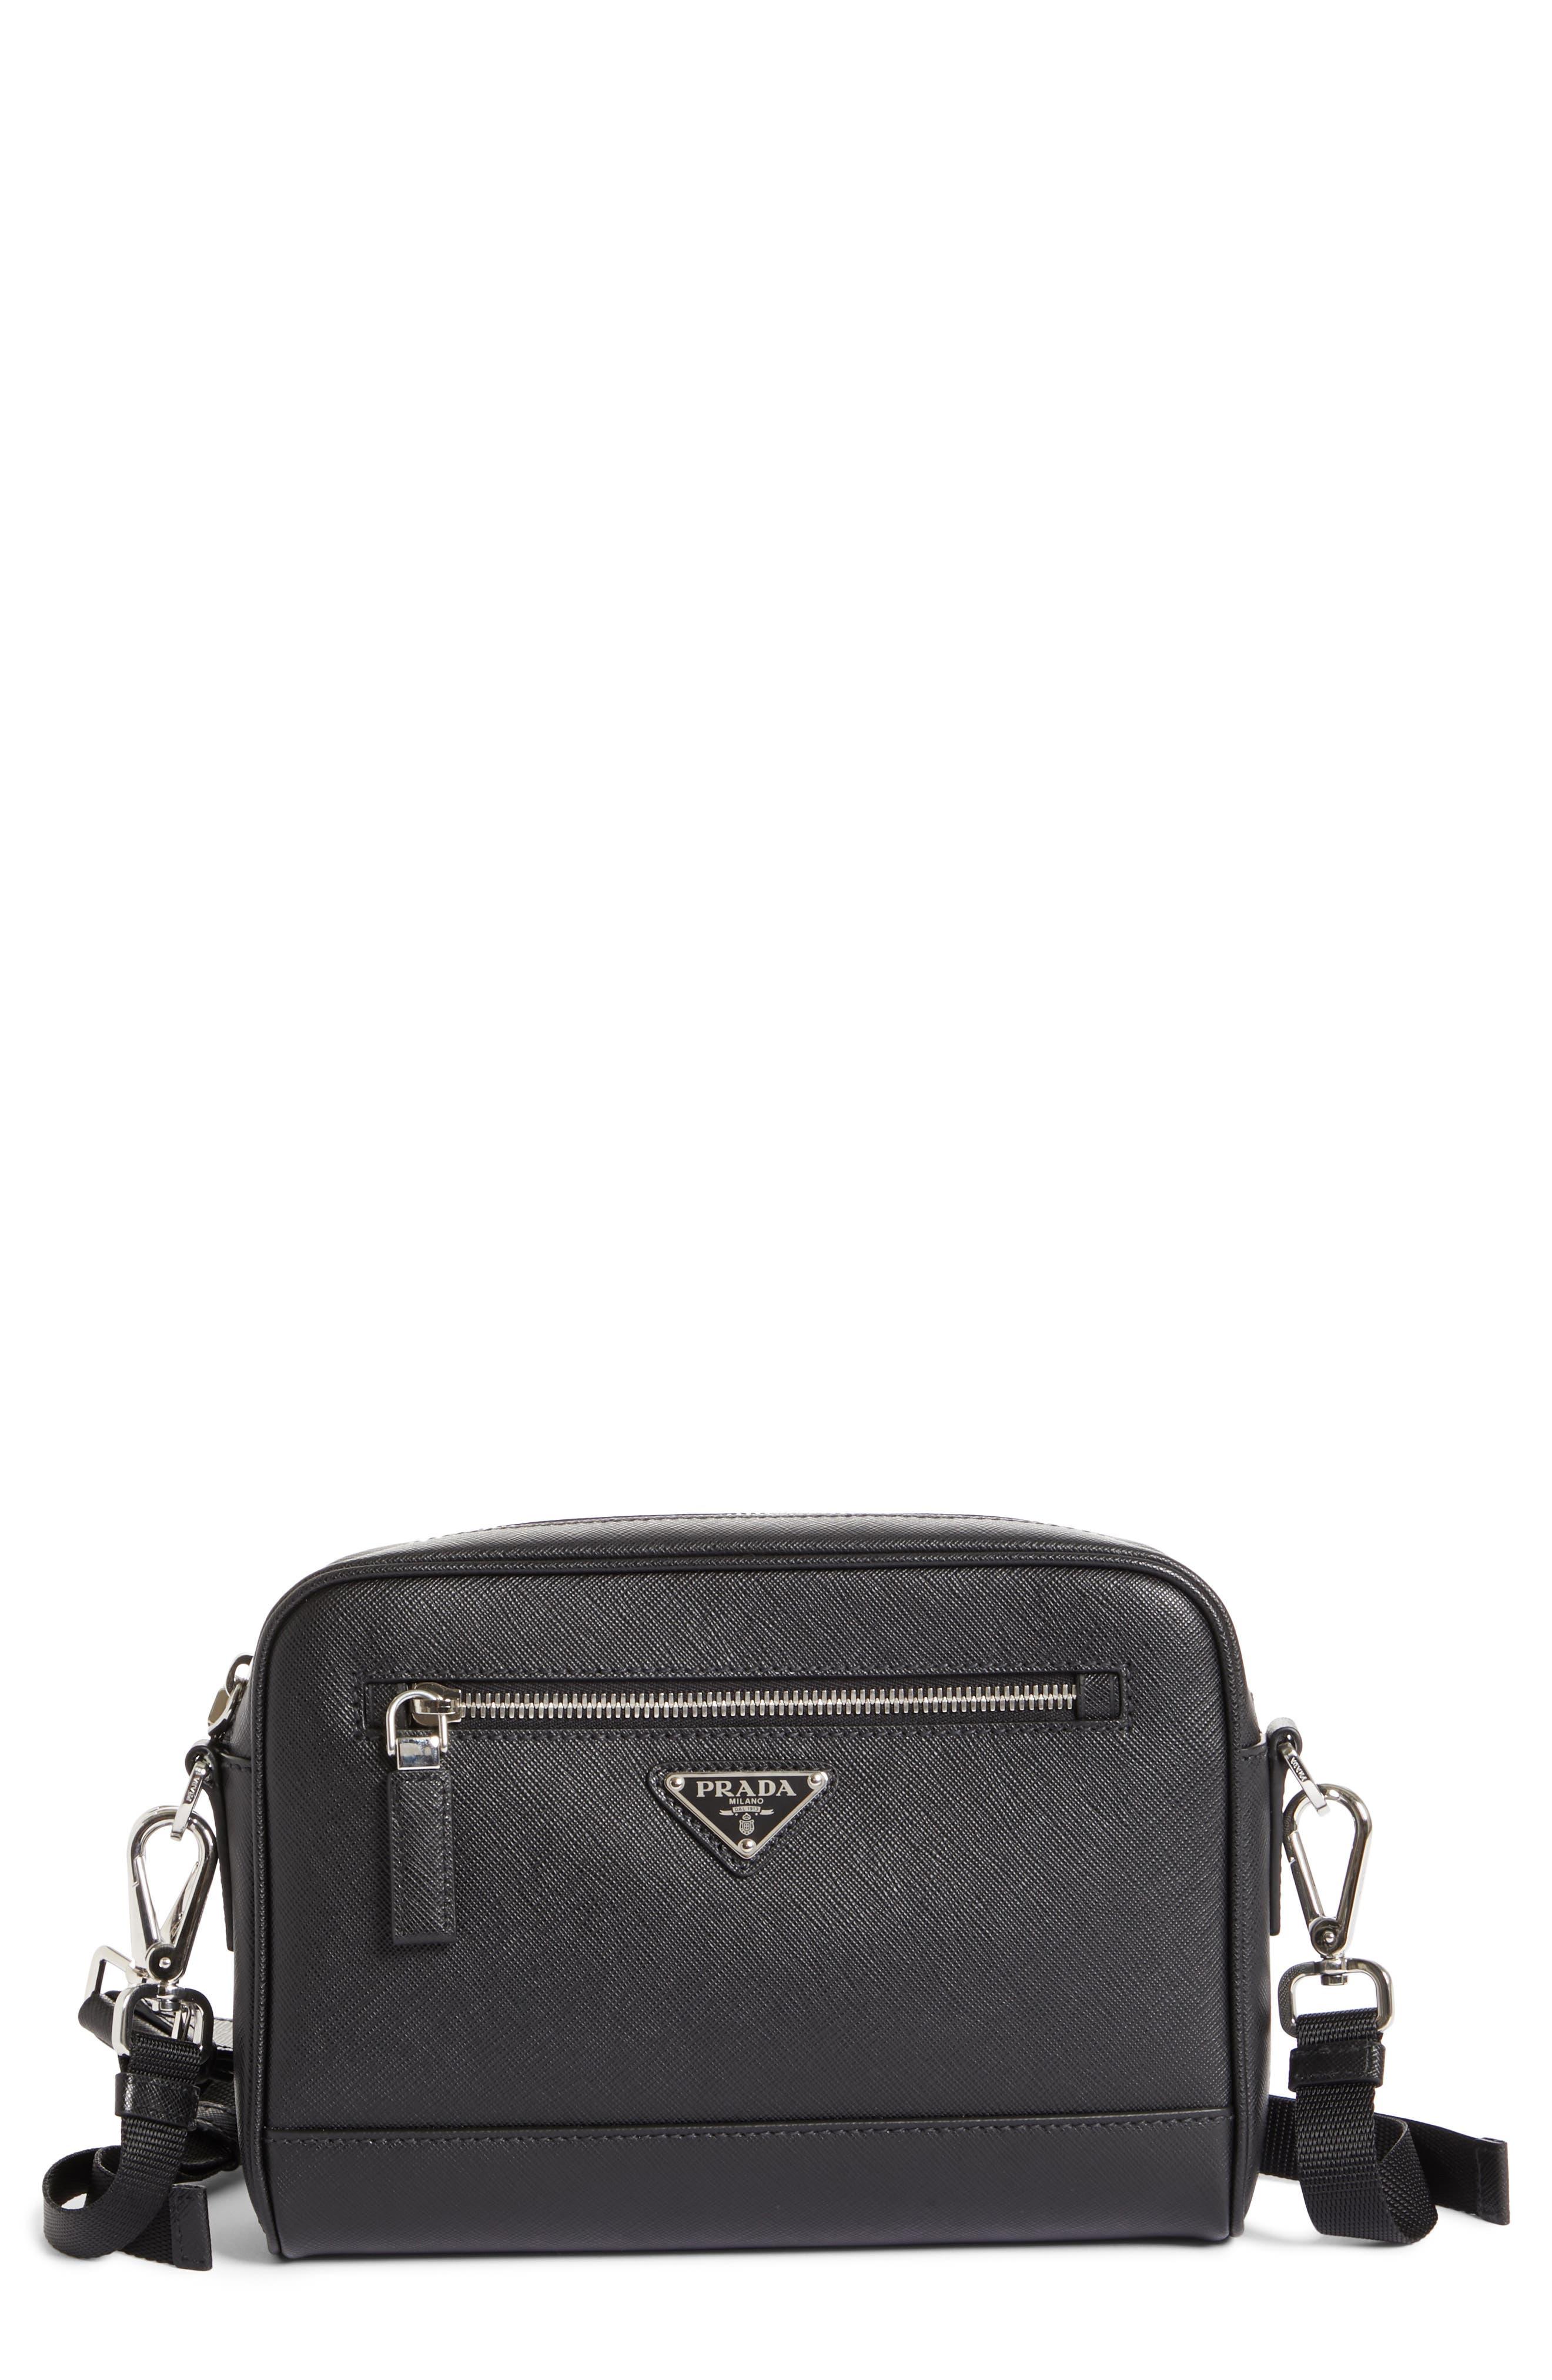 Saffiano Leather Travel Bag,                             Main thumbnail 1, color,                             001